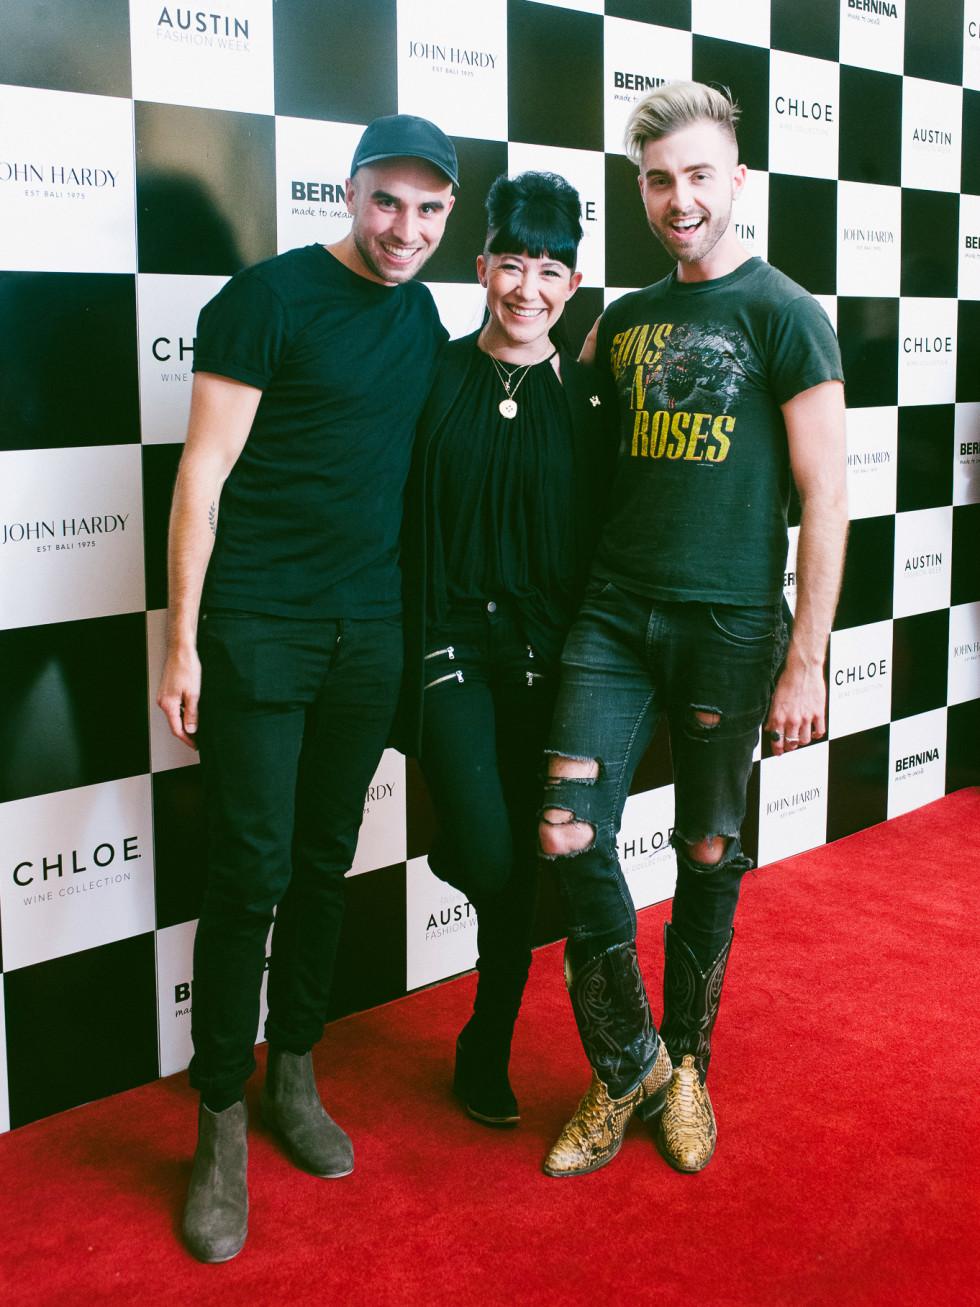 Austin Fashion Week 2016 red carpet Sean Kelly Michelle Lesniak Gunnar Deatherage